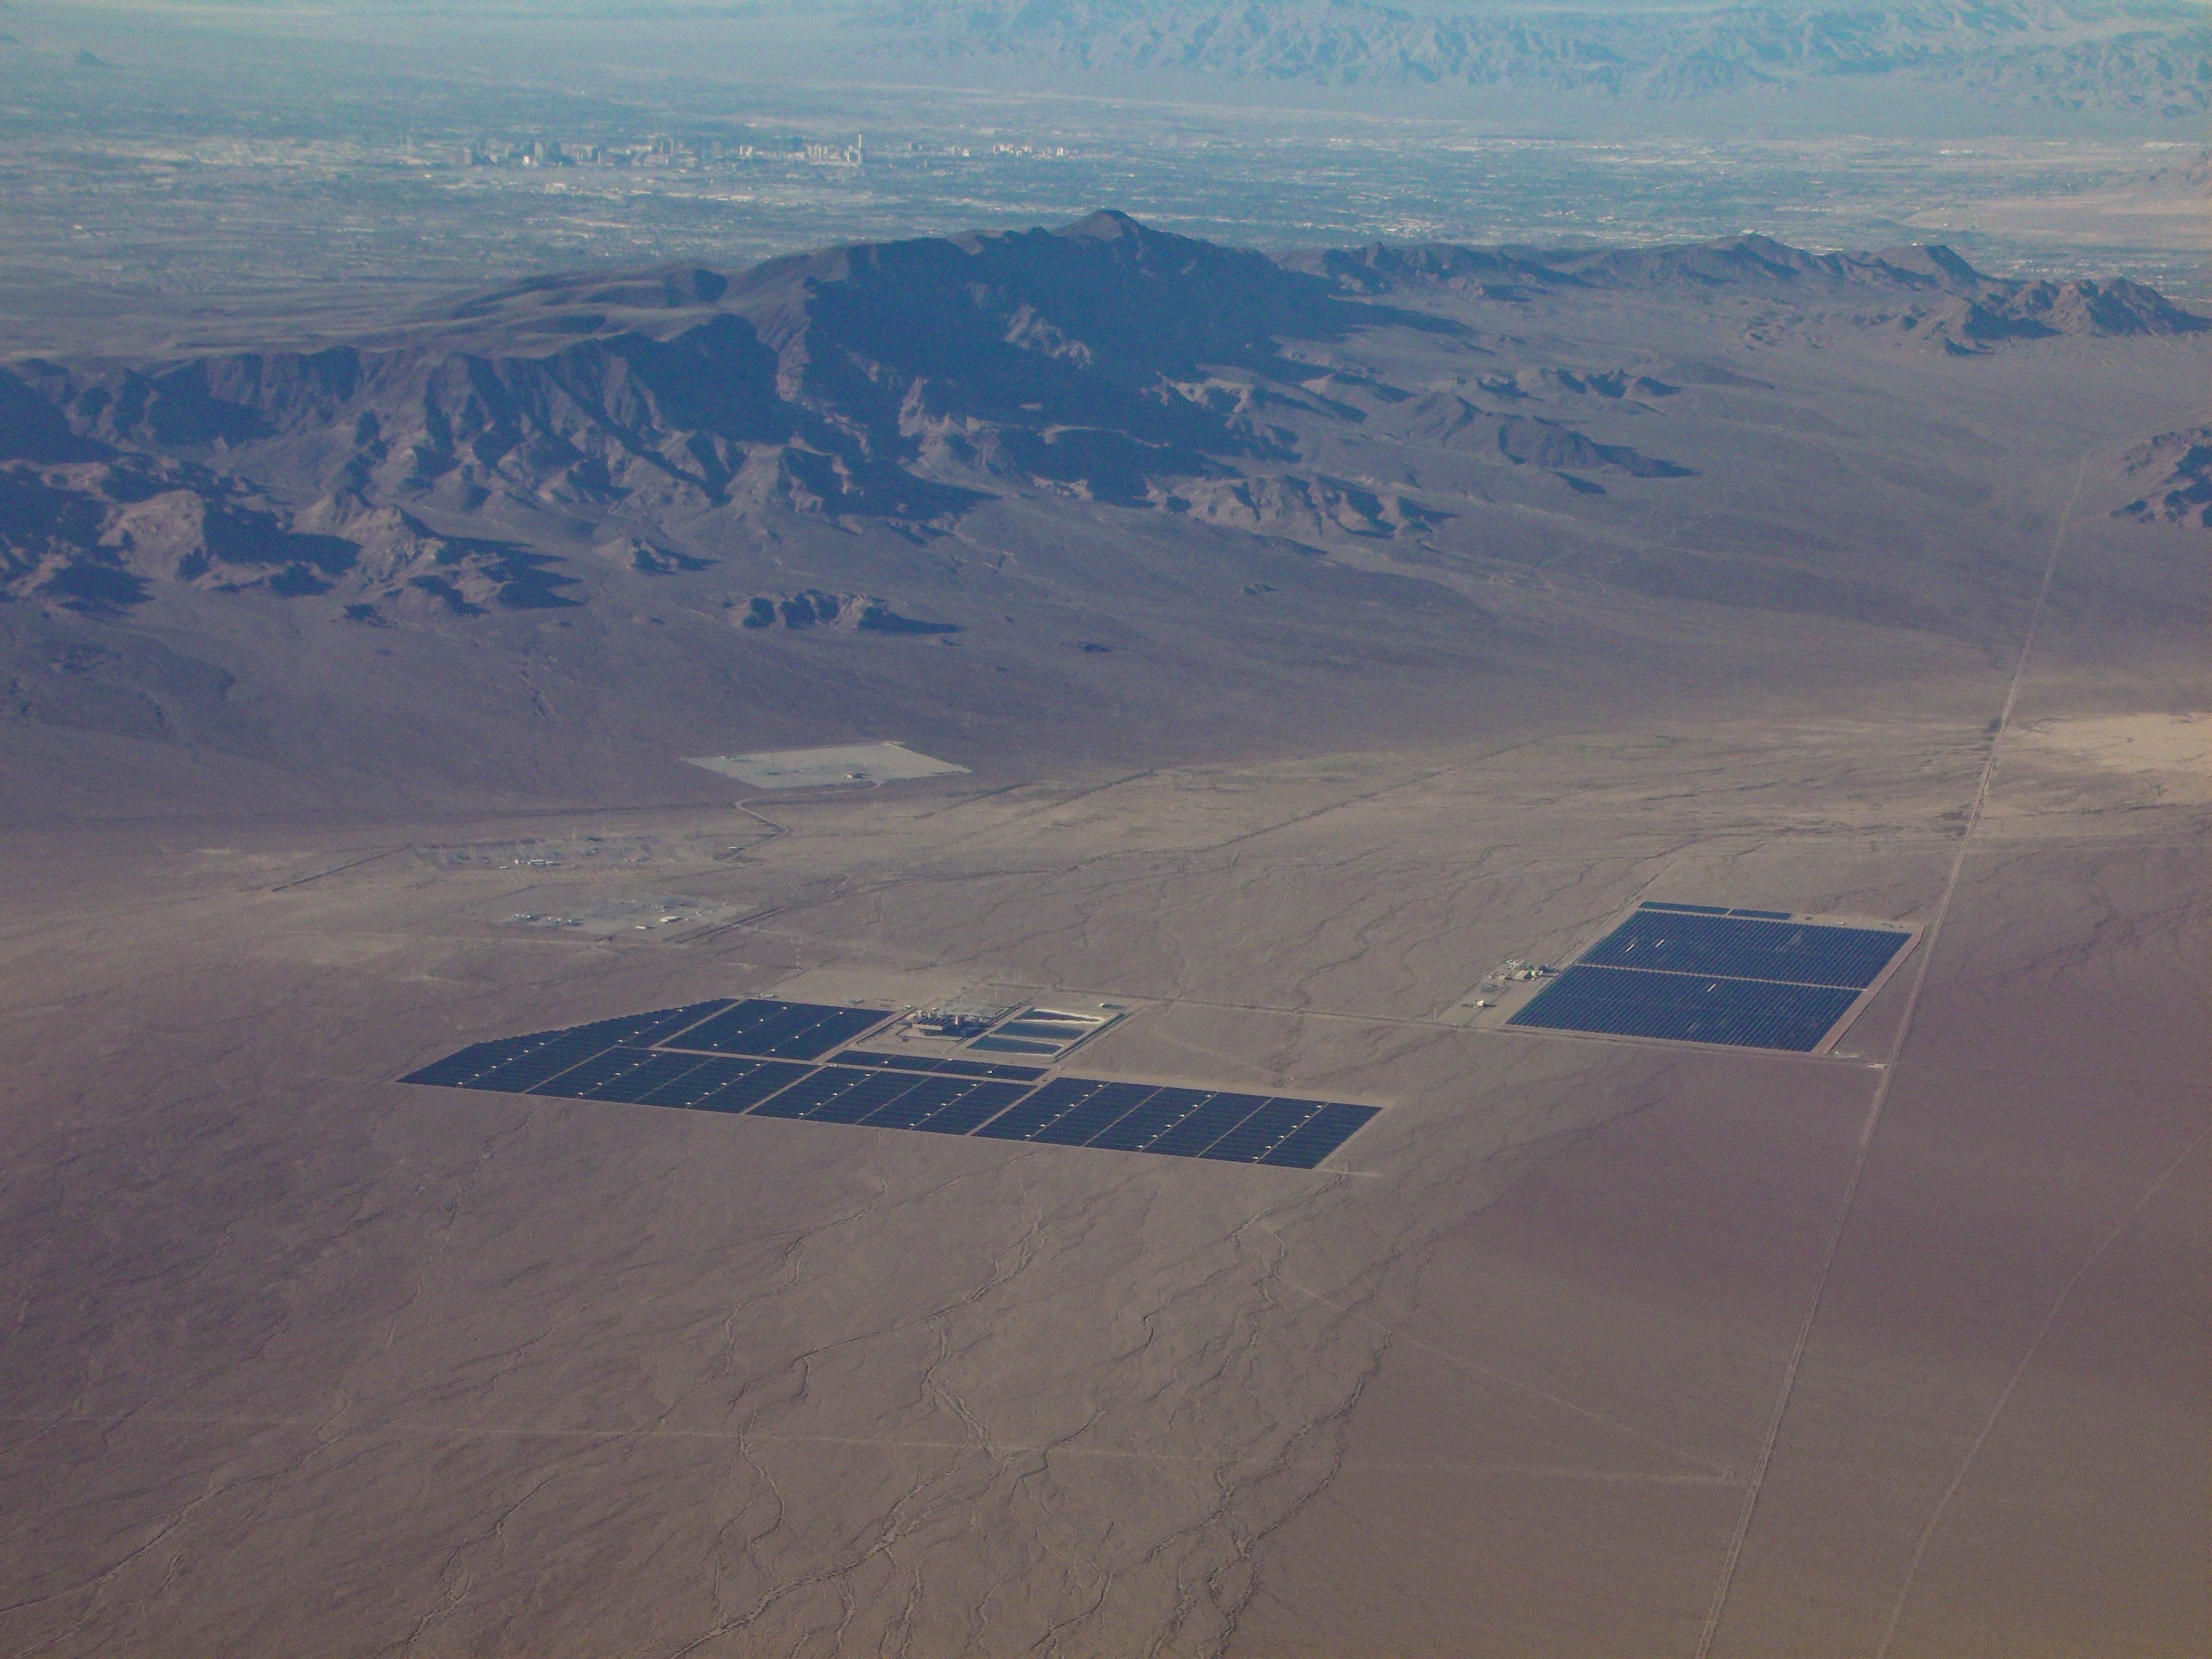 Solar power plants in the Mojave Desert - Wikipedia